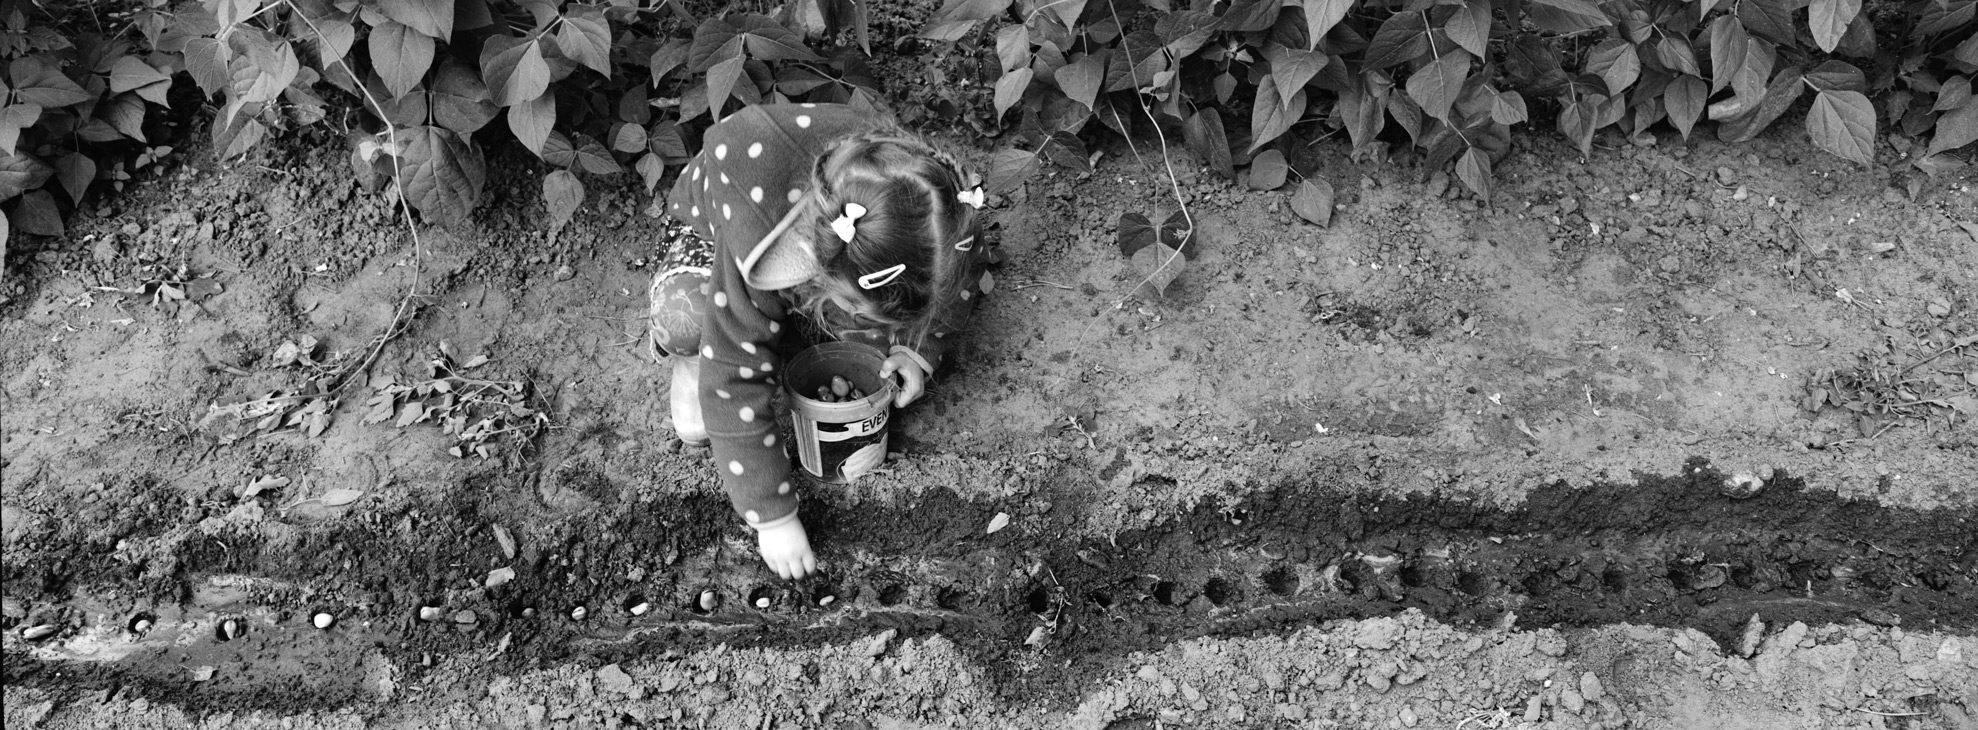 Zosia in the garden, f = 8, exp = 1 / 60s,